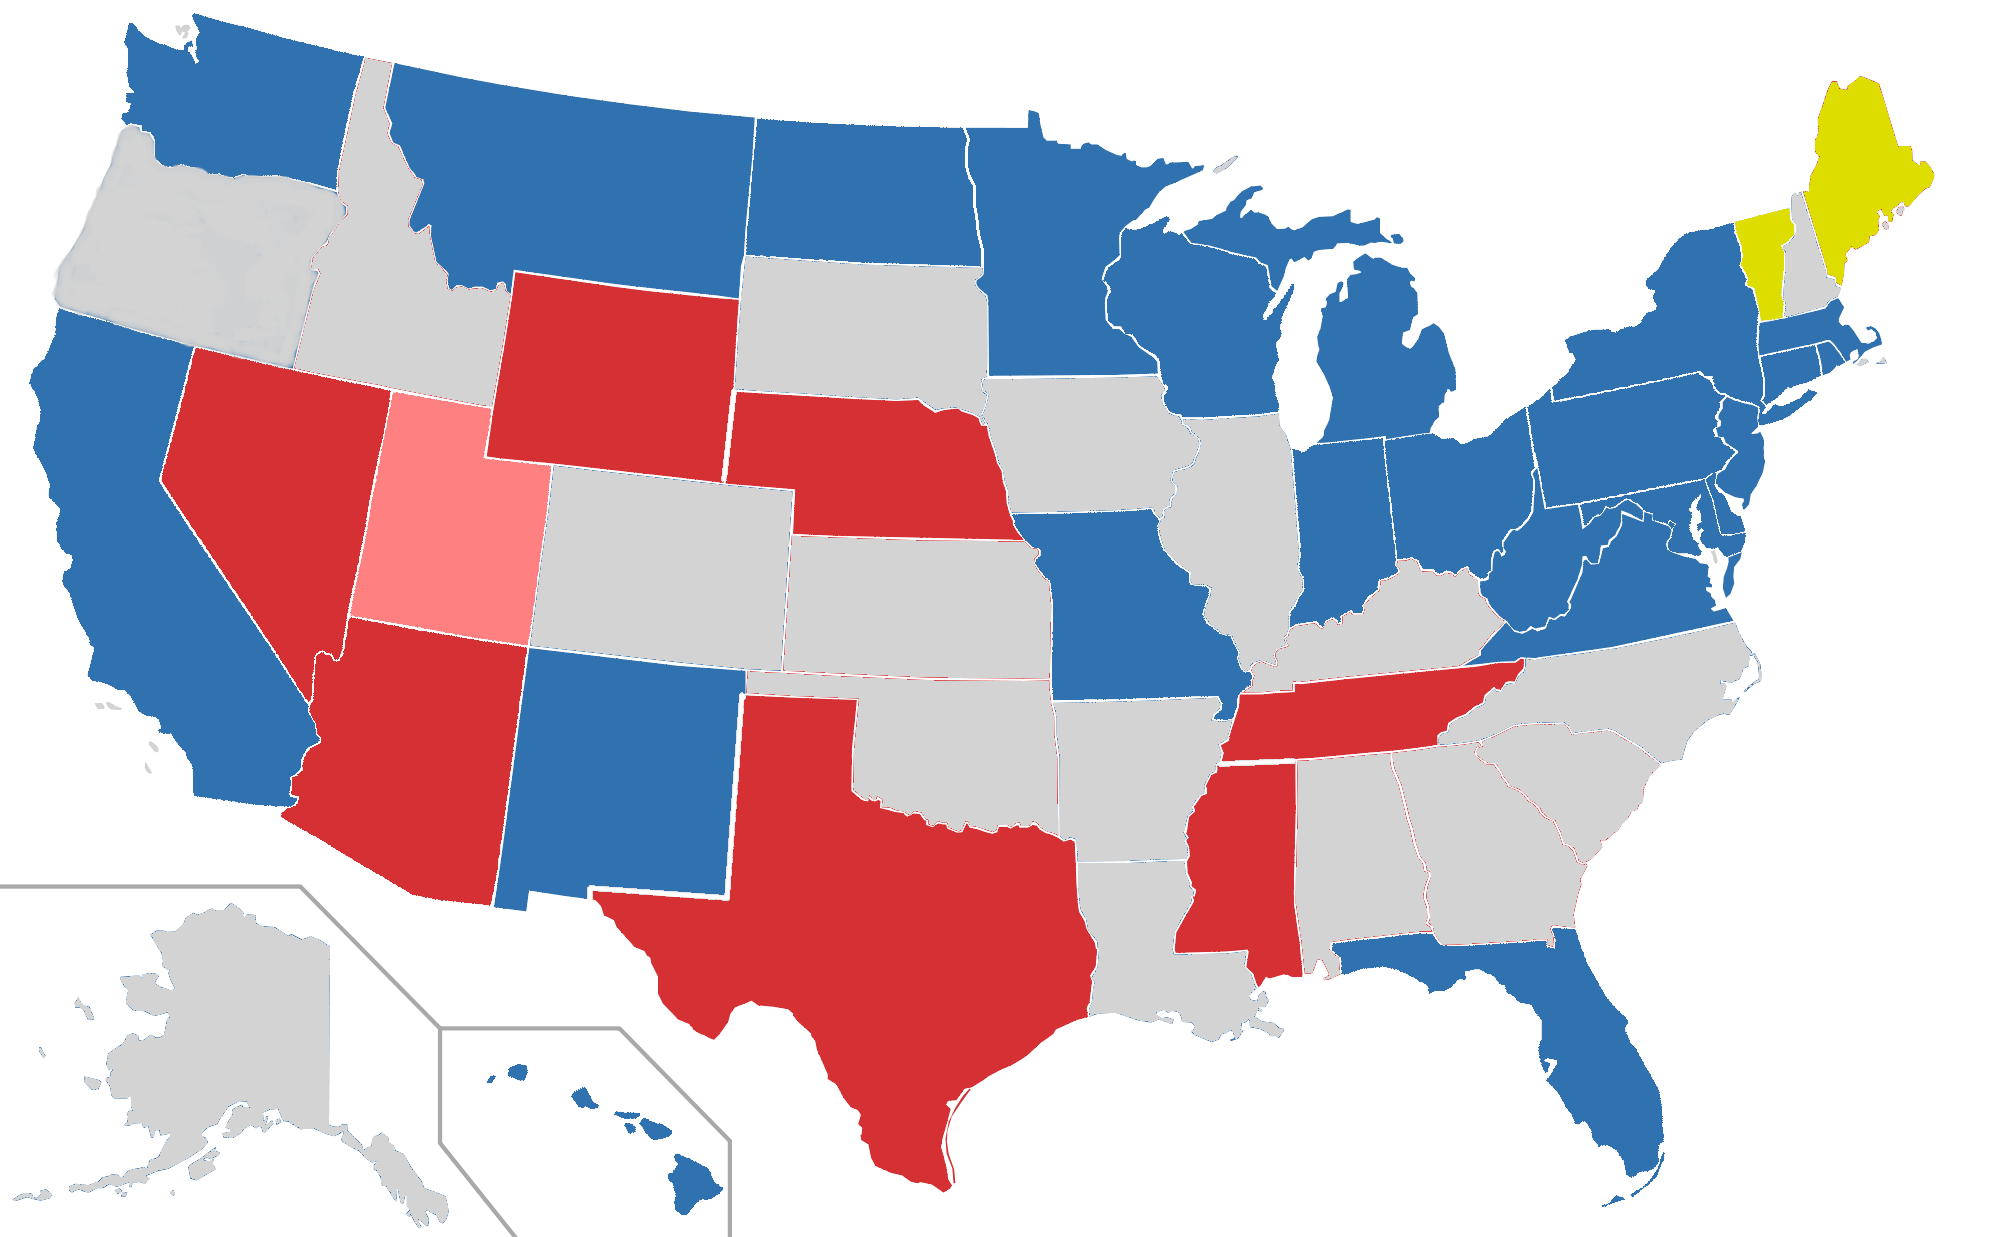 United States Map Free PNG - 8050 - TransparentPNG